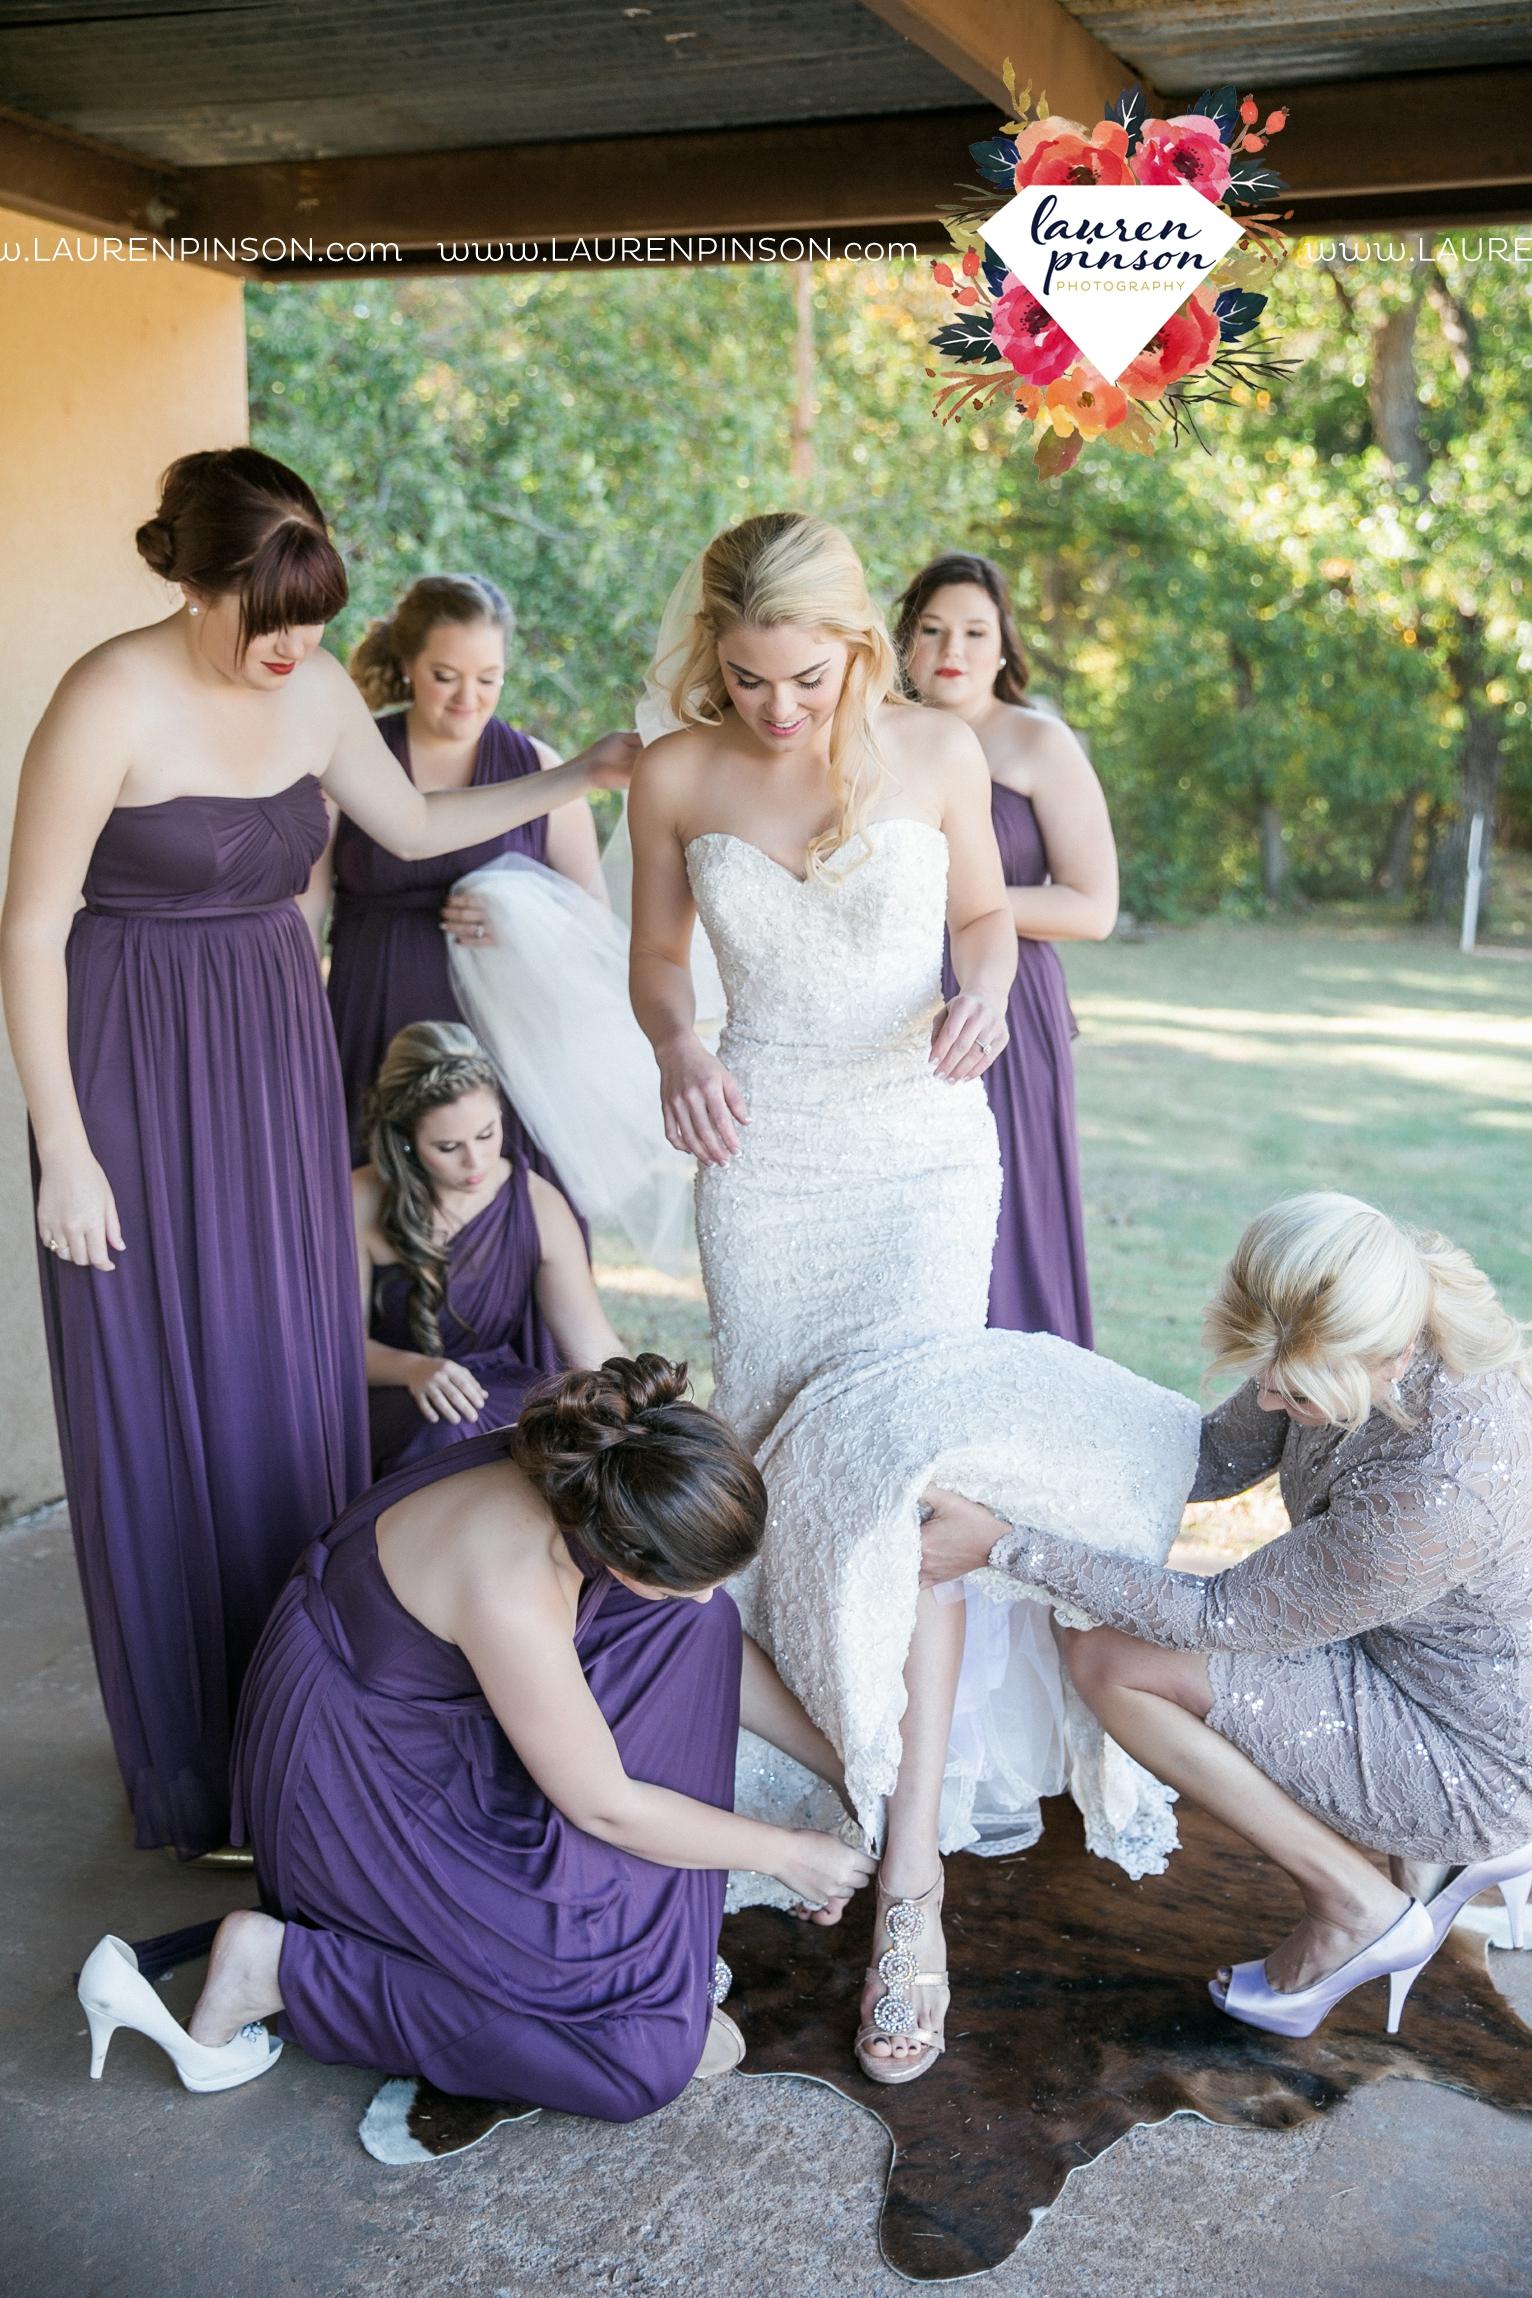 rustic-wichita-falls-texas-wedding-photographer-gold-glam-mayfield-events-market-street-united-allue-bridals-fall_1715.jpg